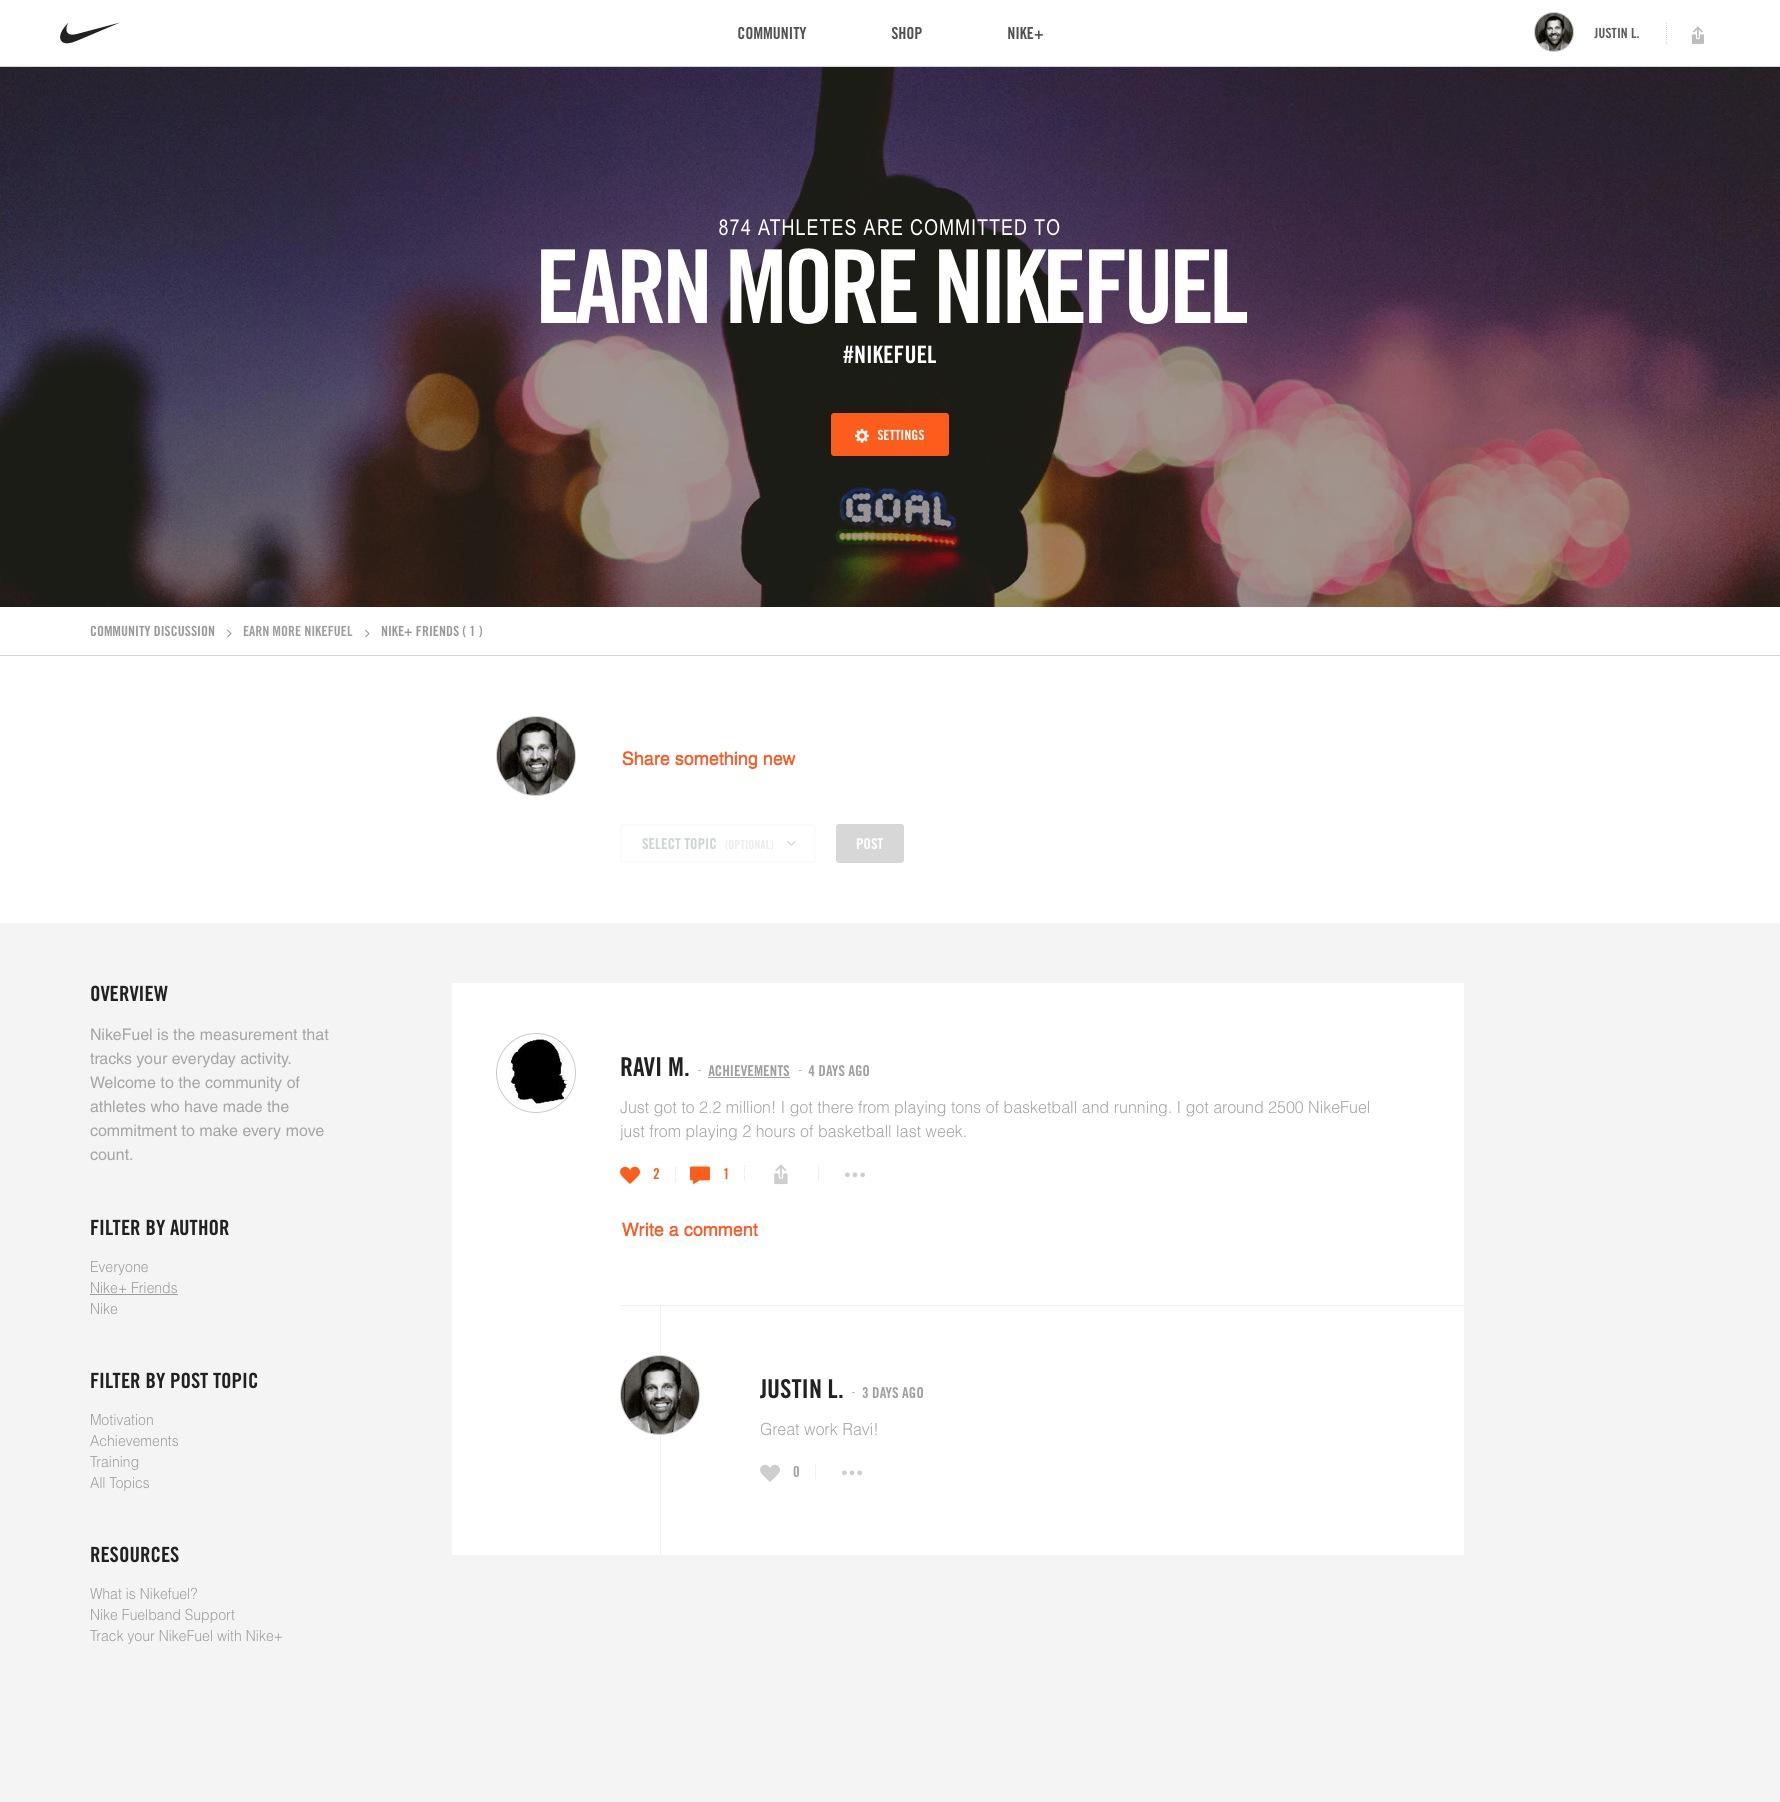 Earn More NikeFuel - Nike Community.jpg